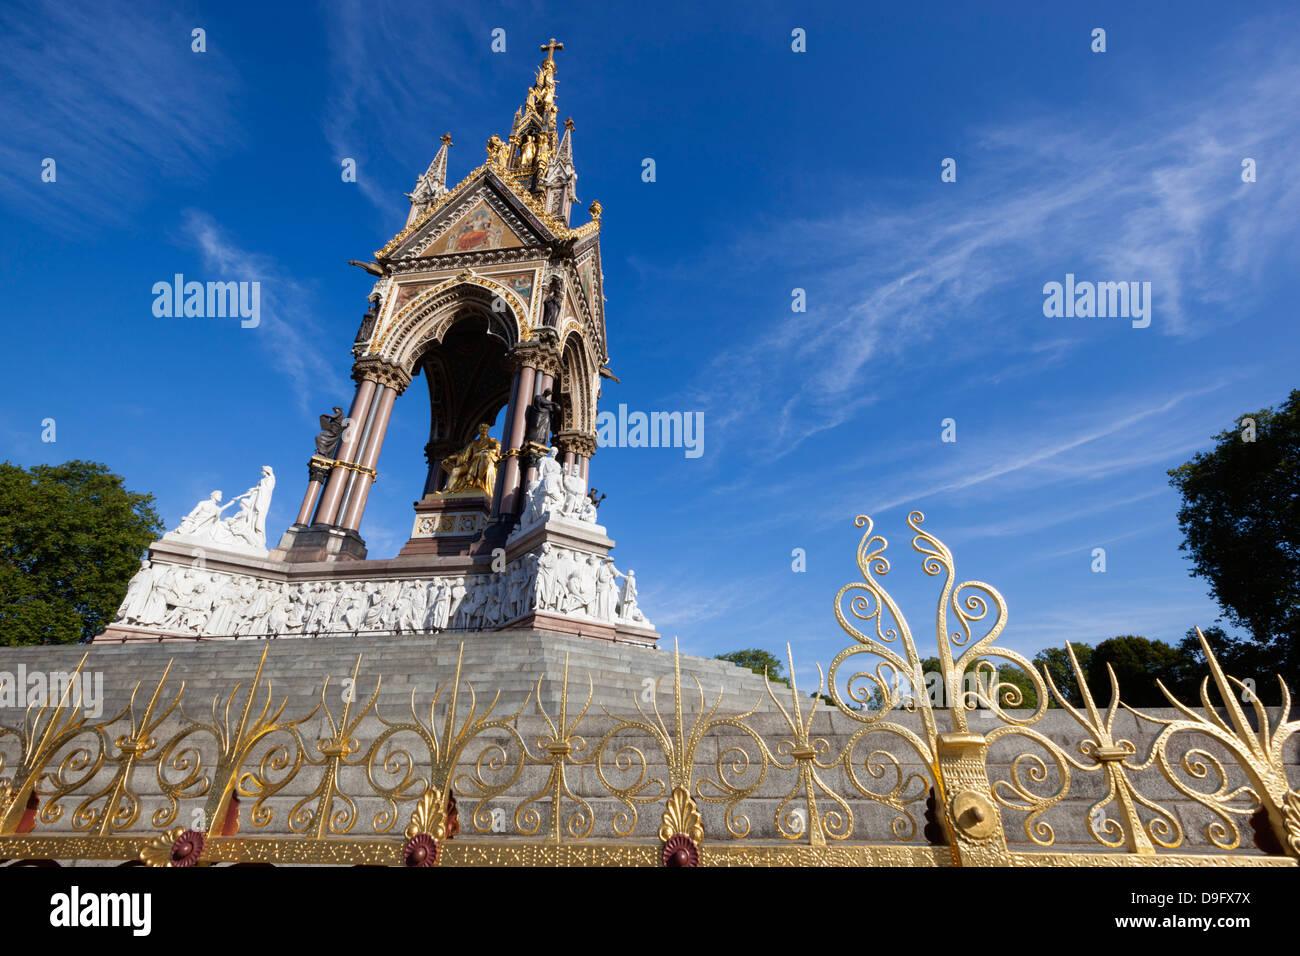 The Albert Memorial, Kensington Gardens, London, England, UK - Stock Image